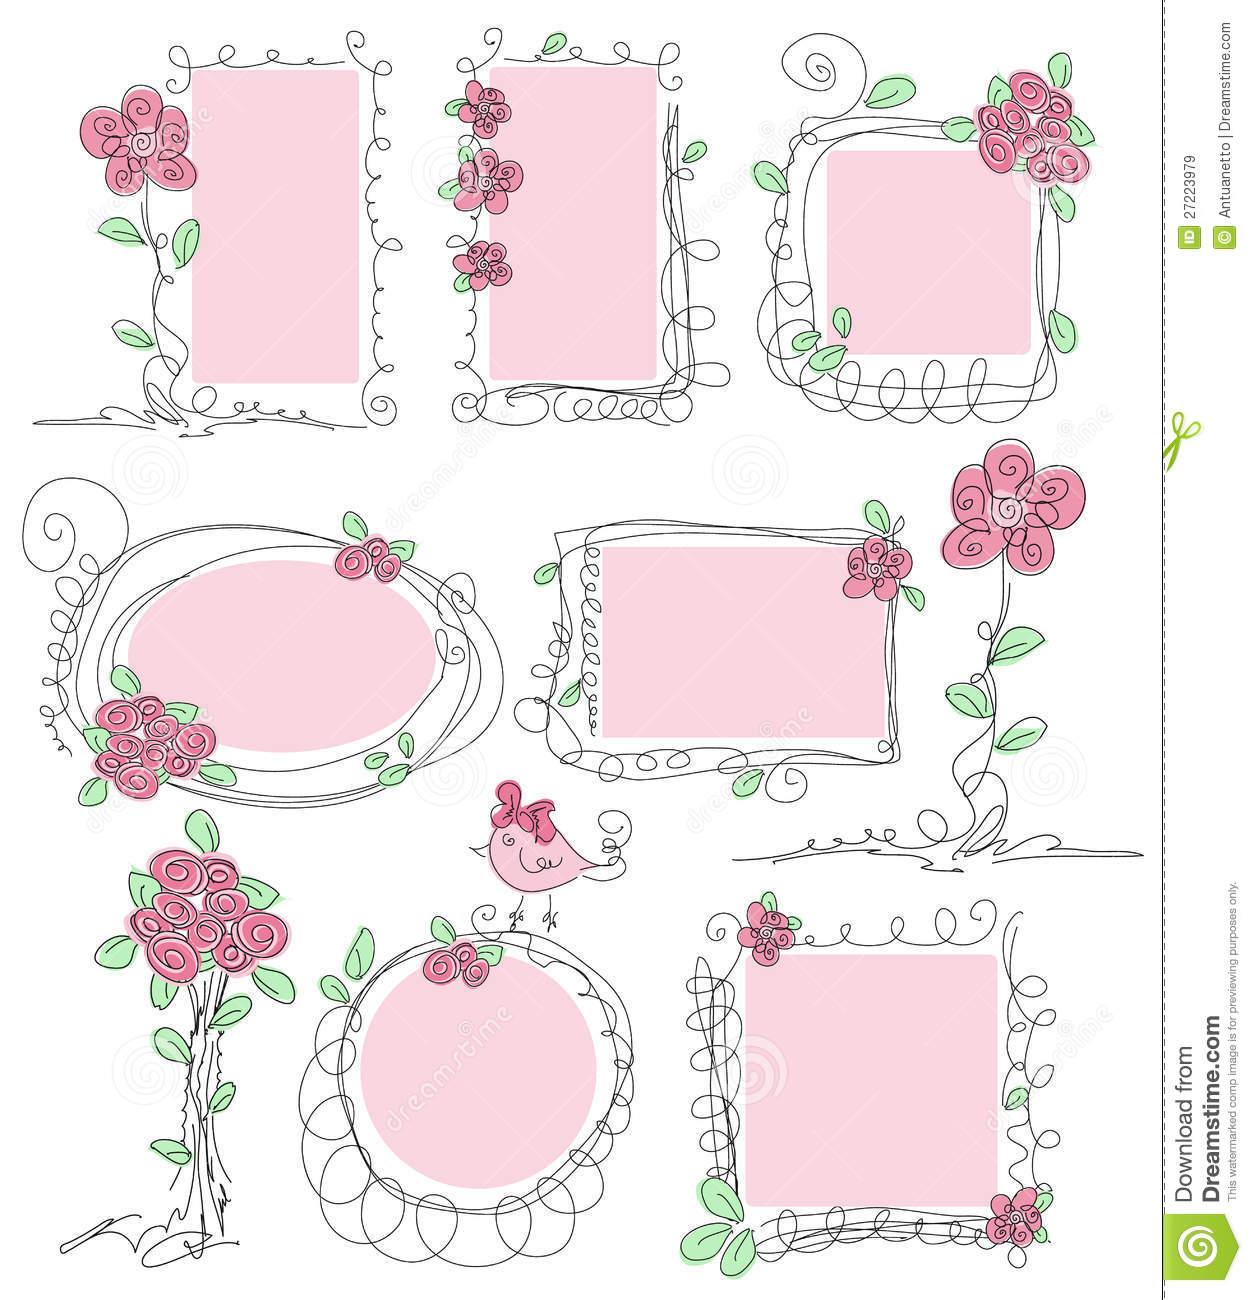 19 vector cute frame images cute vector frames cute vector frames and cute vector frames. Black Bedroom Furniture Sets. Home Design Ideas